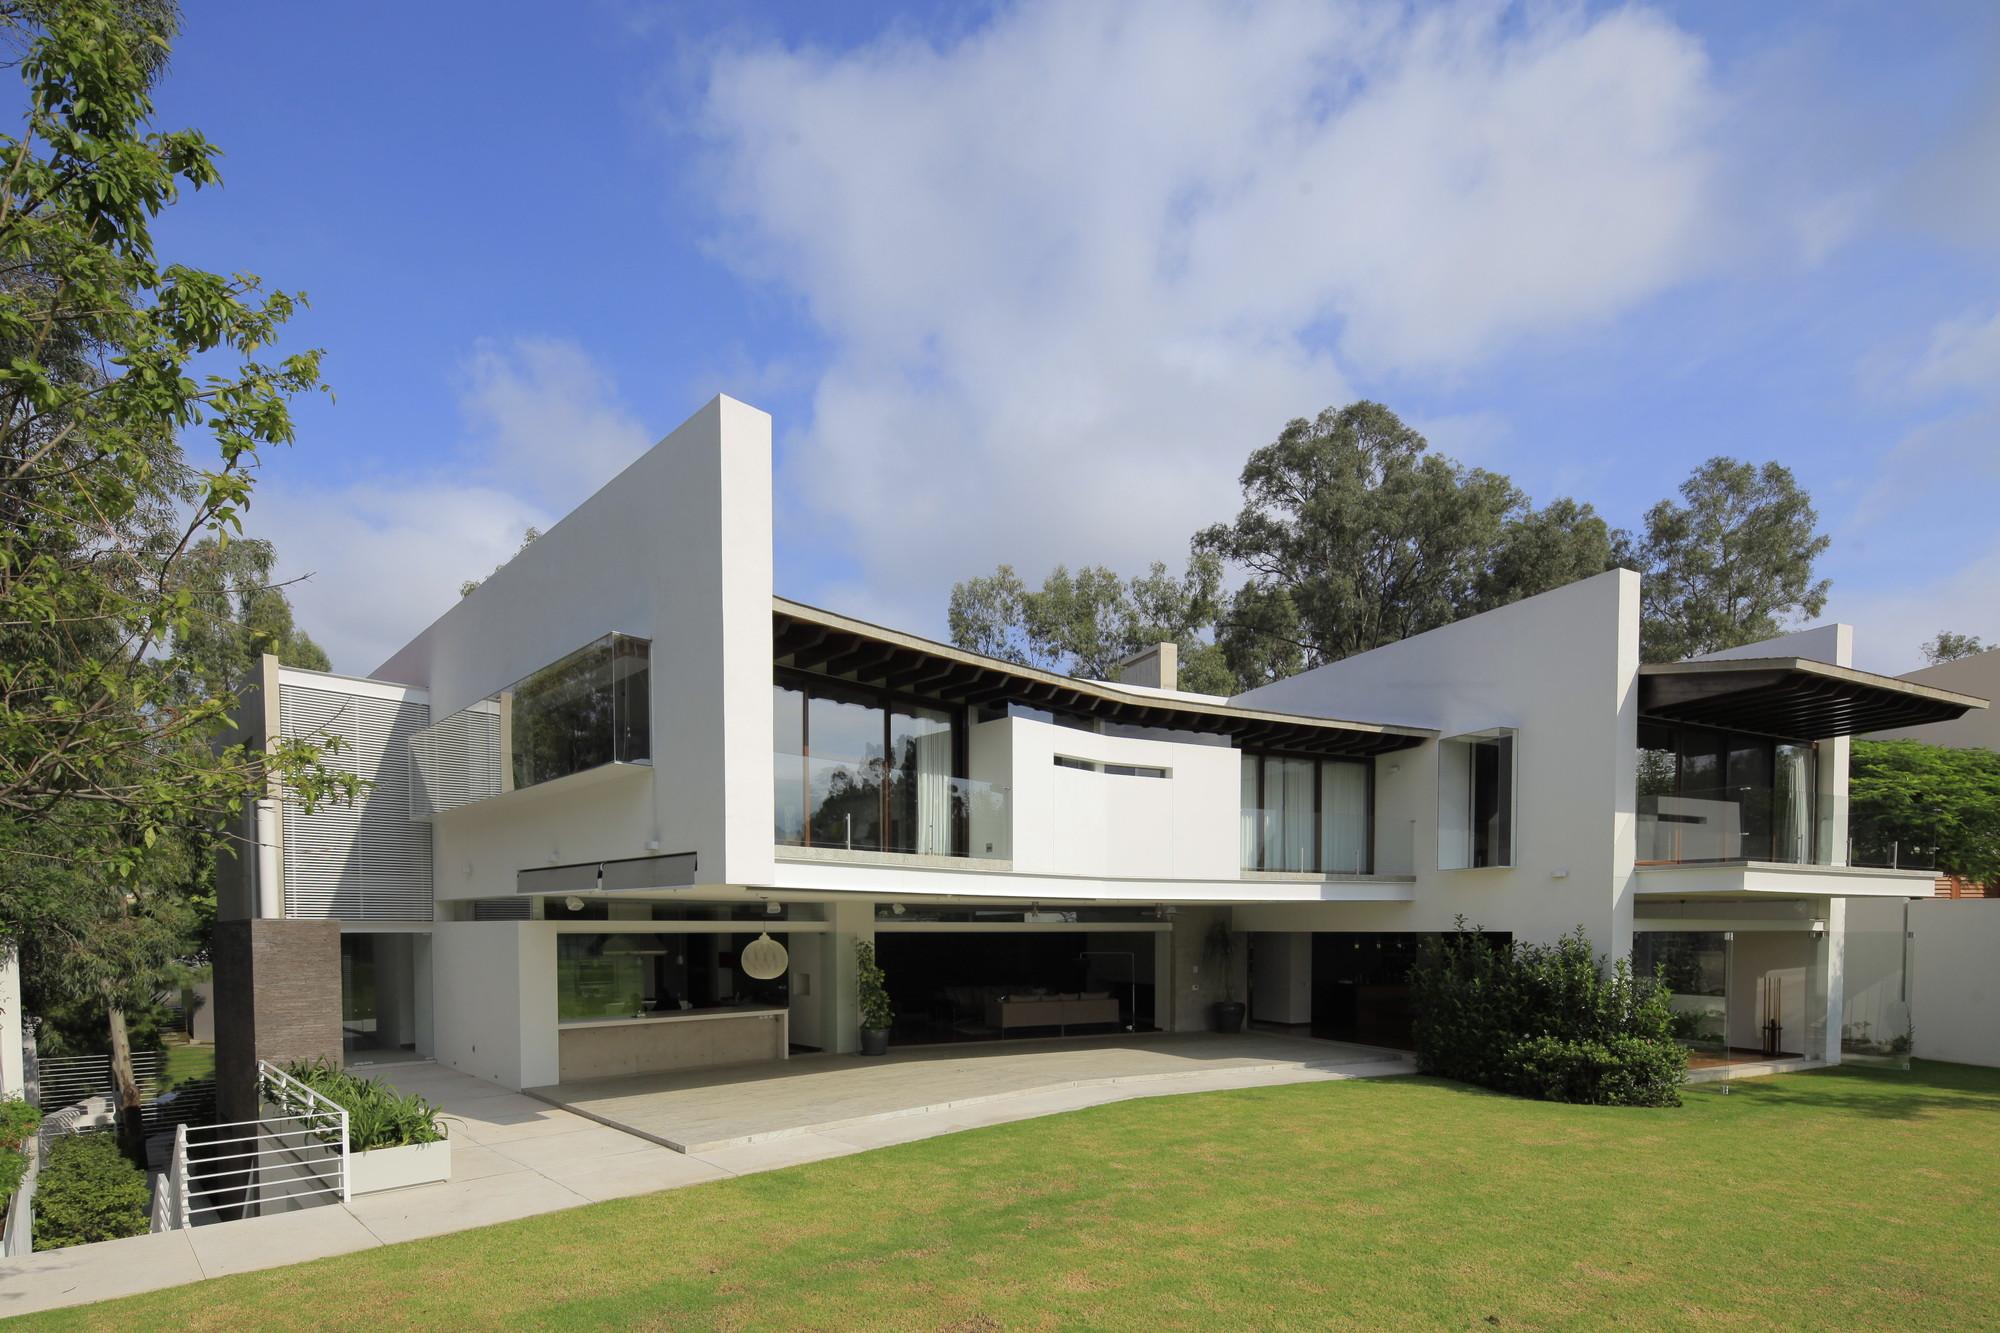 Casa sete hern ndez silva arquitectos archdaily brasil for Casa fernando ciudad jardin